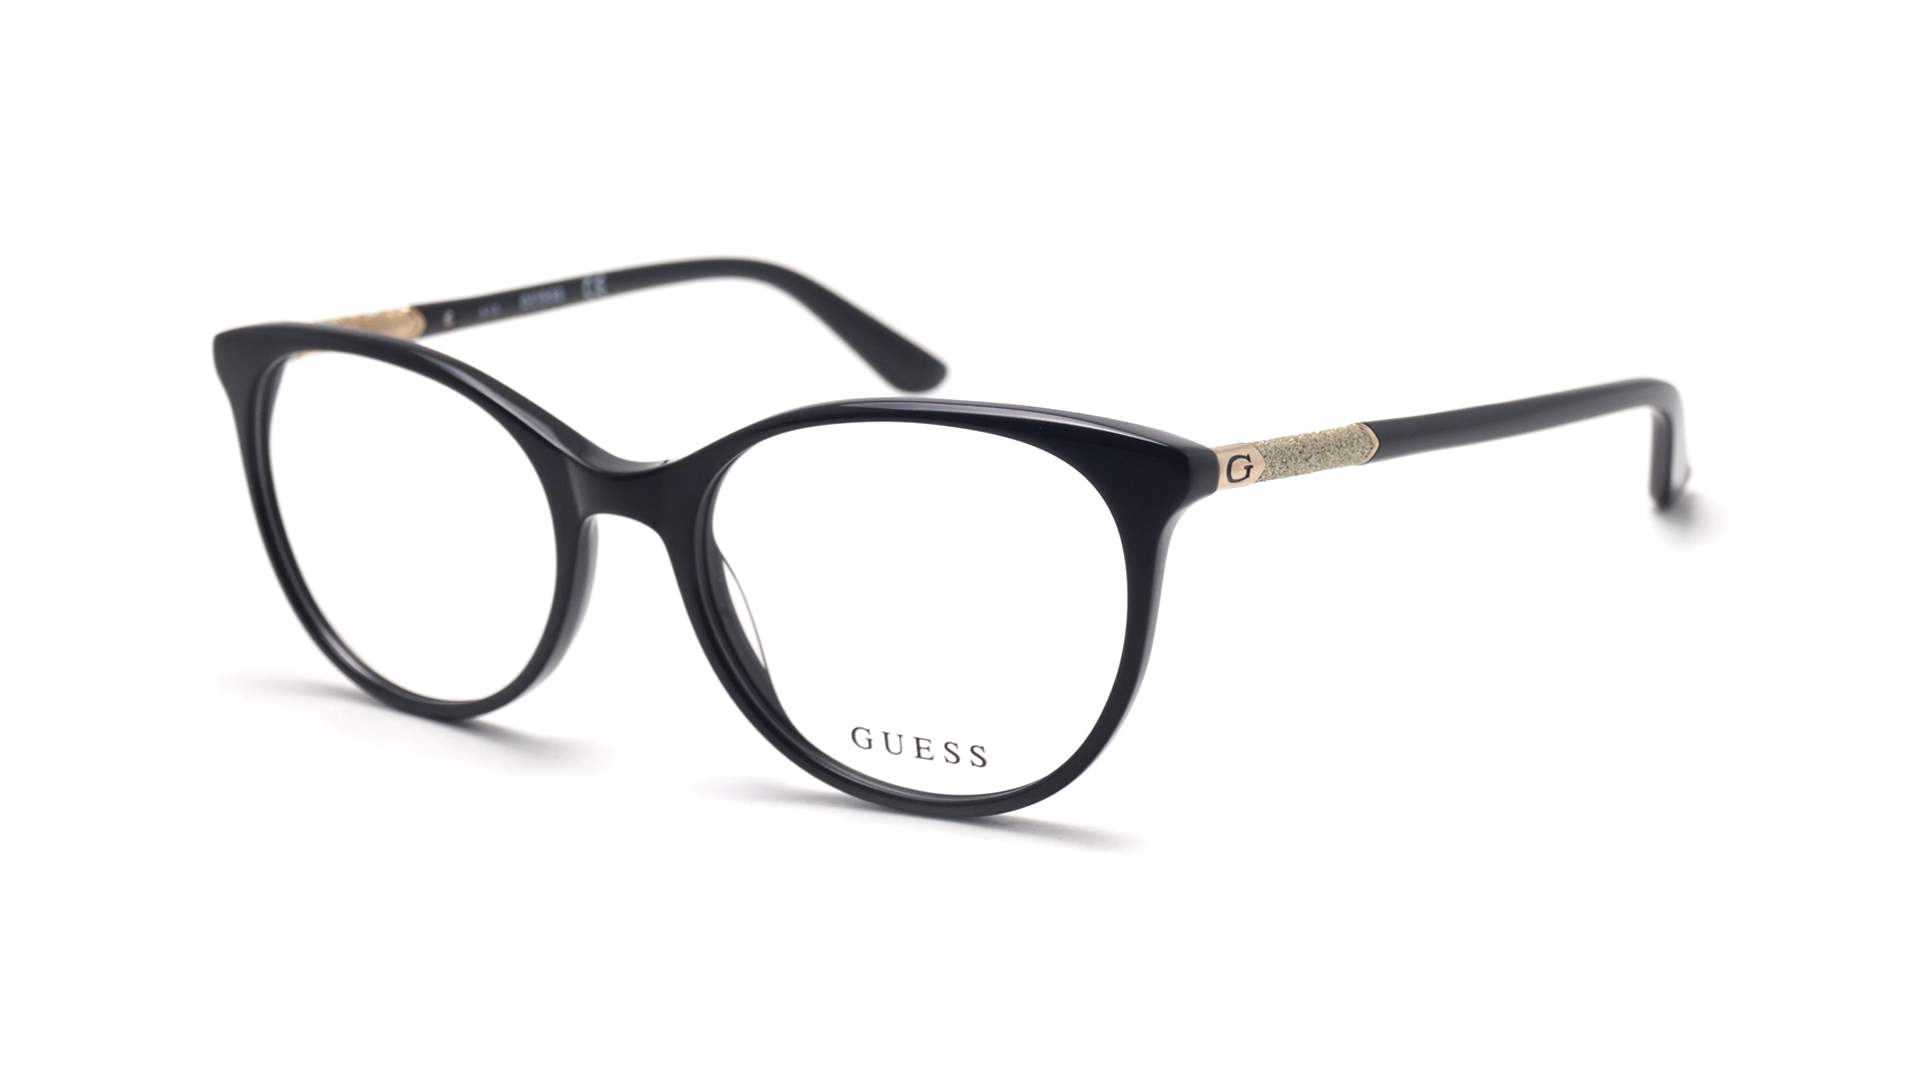 653a4d3044 Guess GU2657 005 52-18 Noir | Prix 104,90 € | Visiofactory